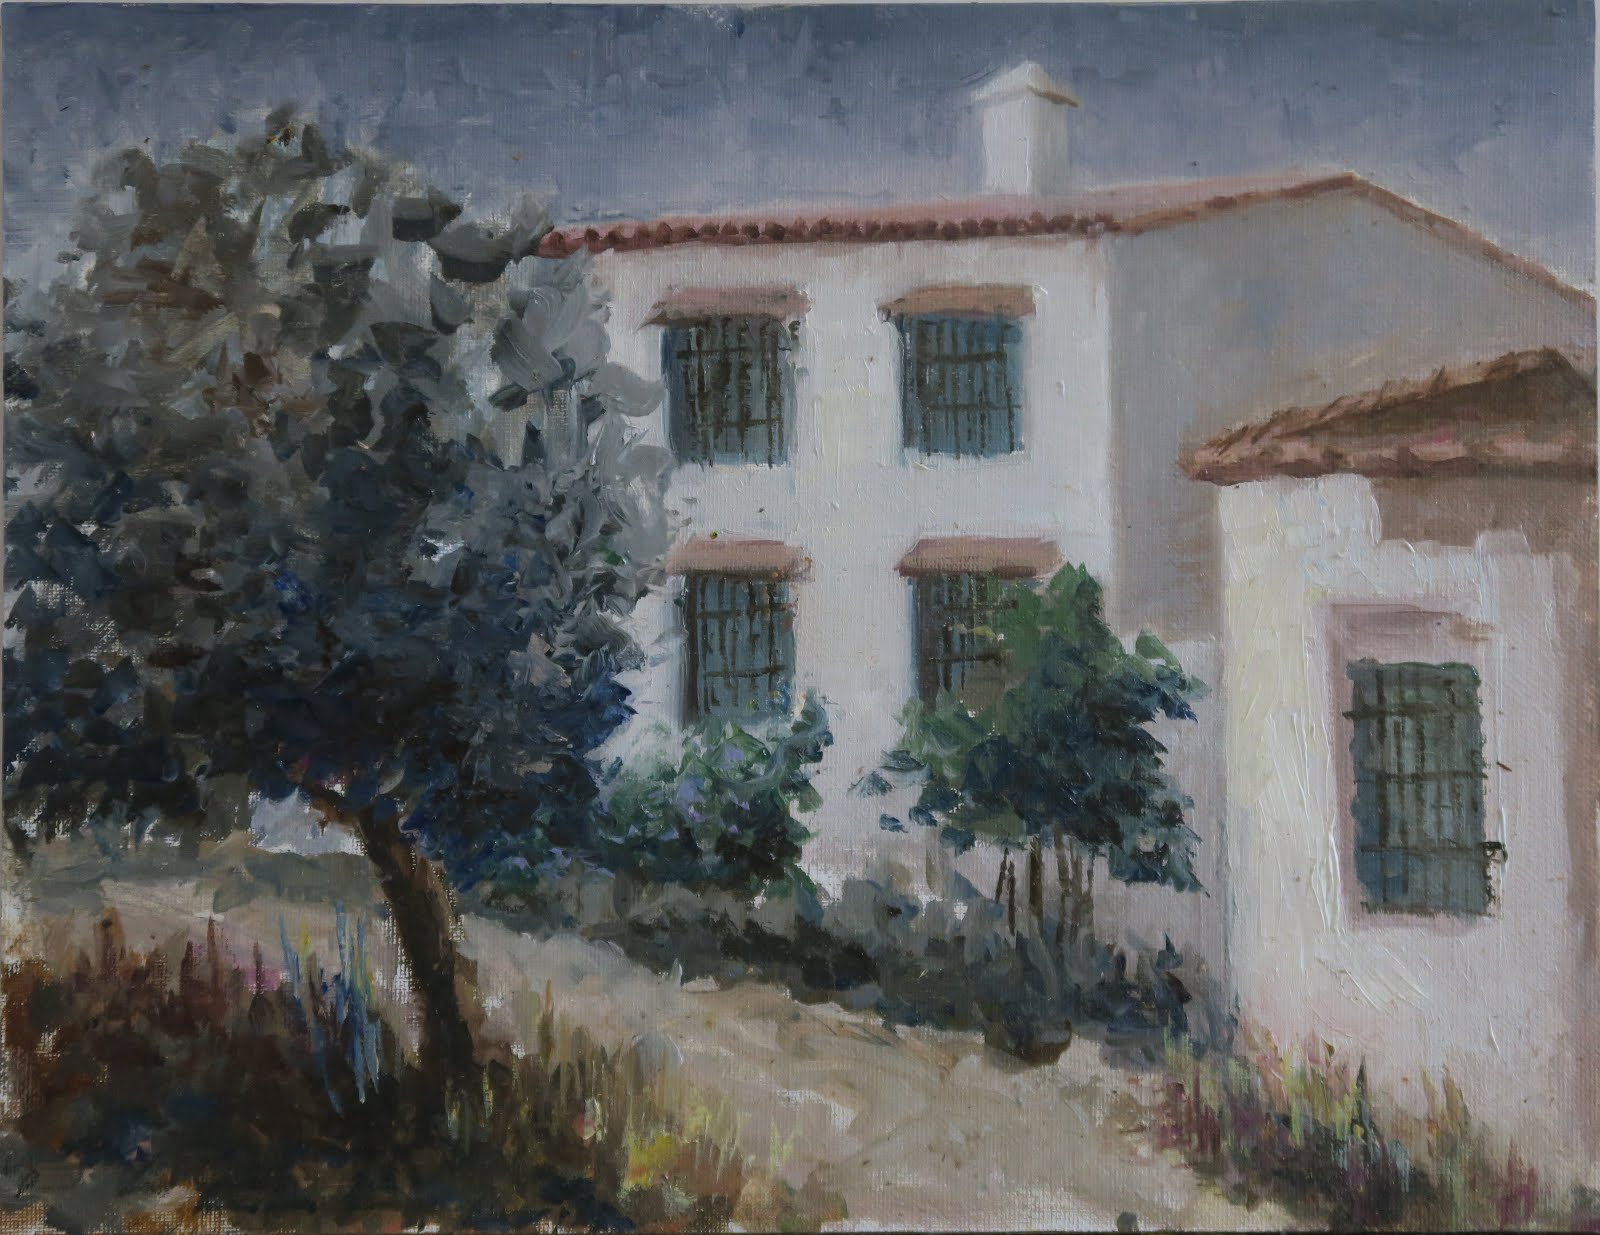 Cortijo; Almogía, Málaga (35x27)